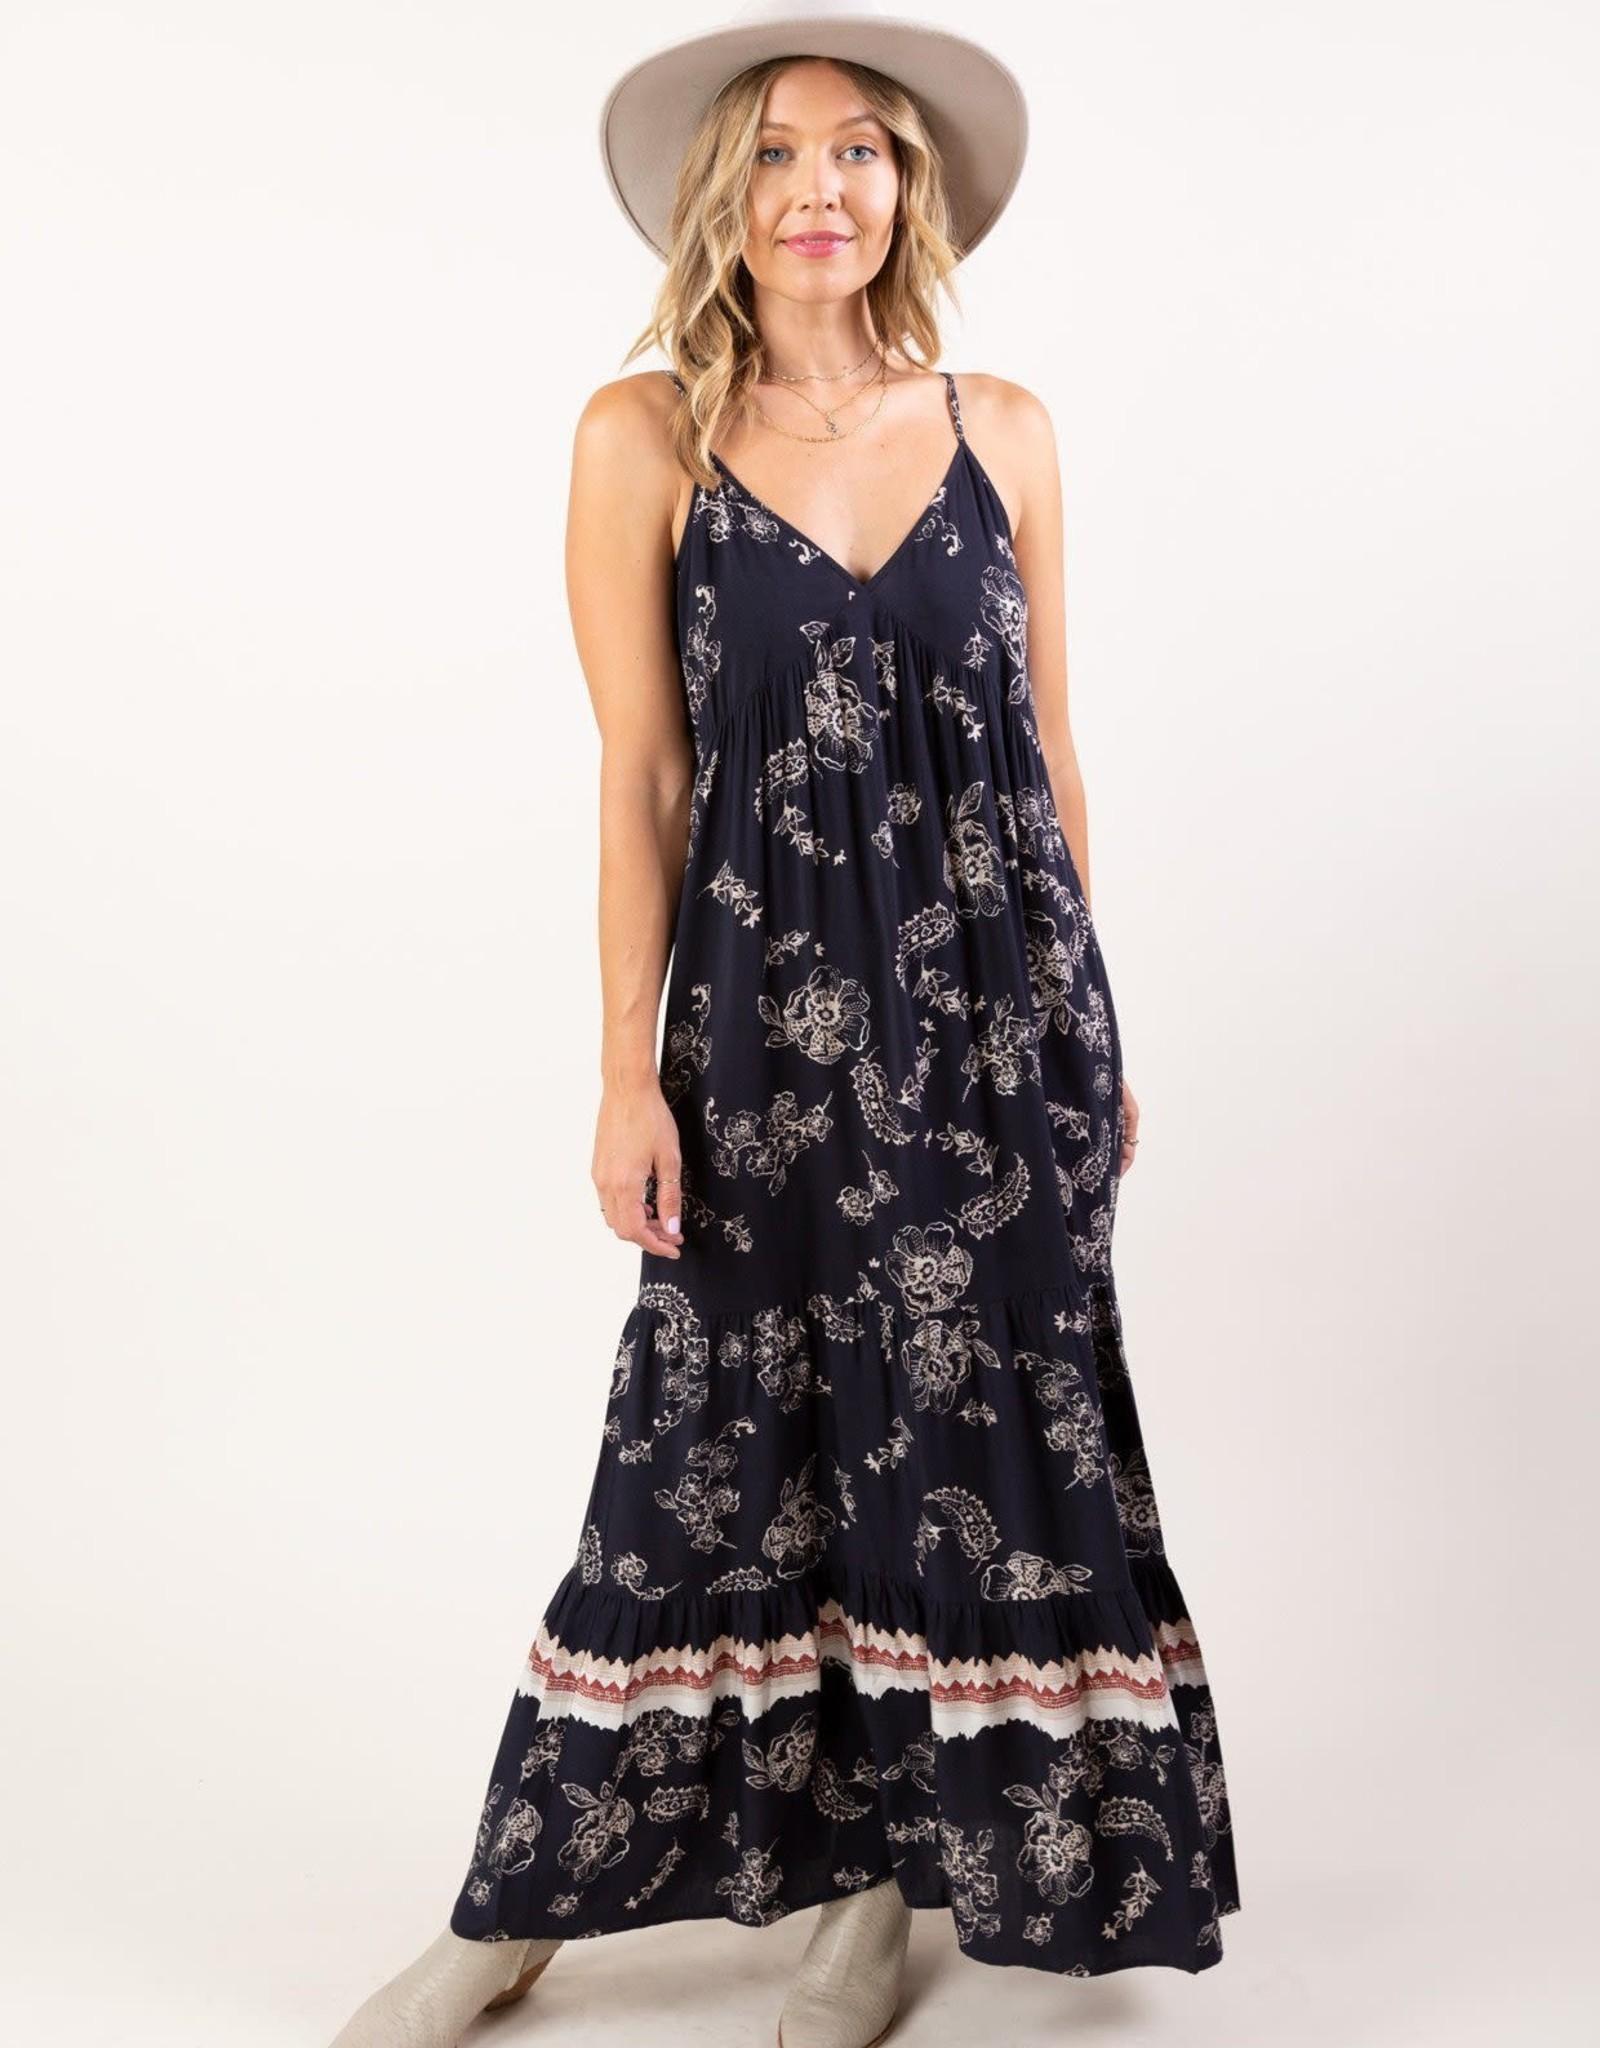 Lovestitch Lovestitch Tiered Maxi Dress